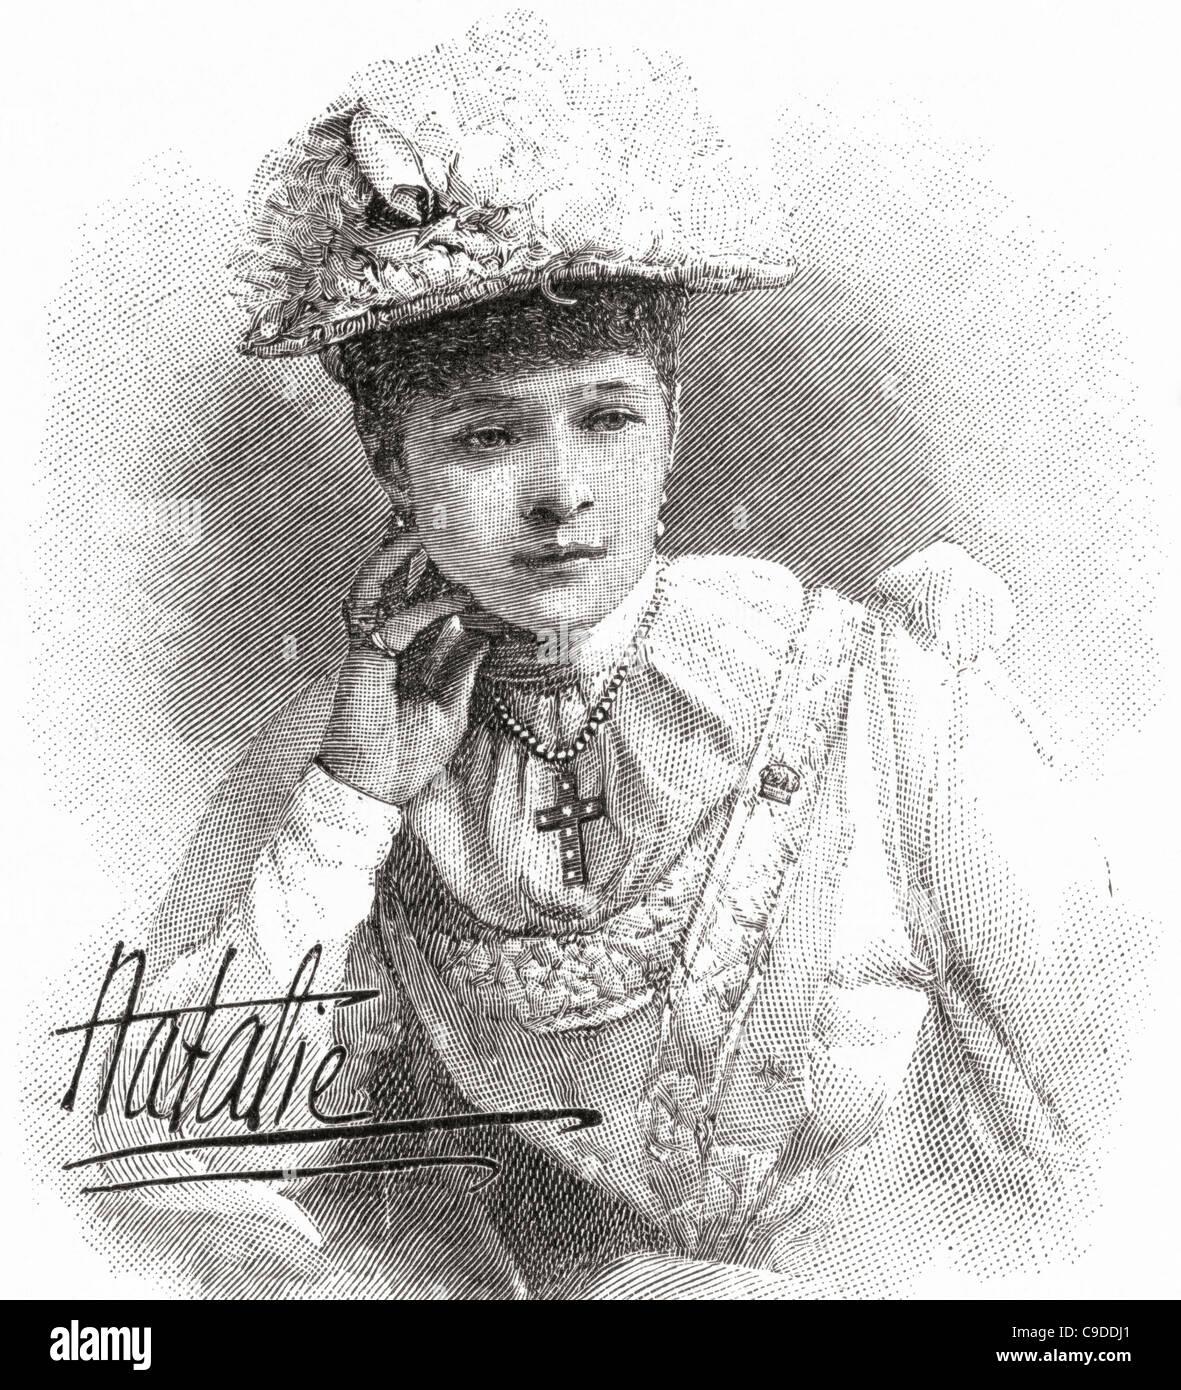 Natalia Janotha, aged 20, 1856 – 1932. Polish pianist and composer. Stock Photo